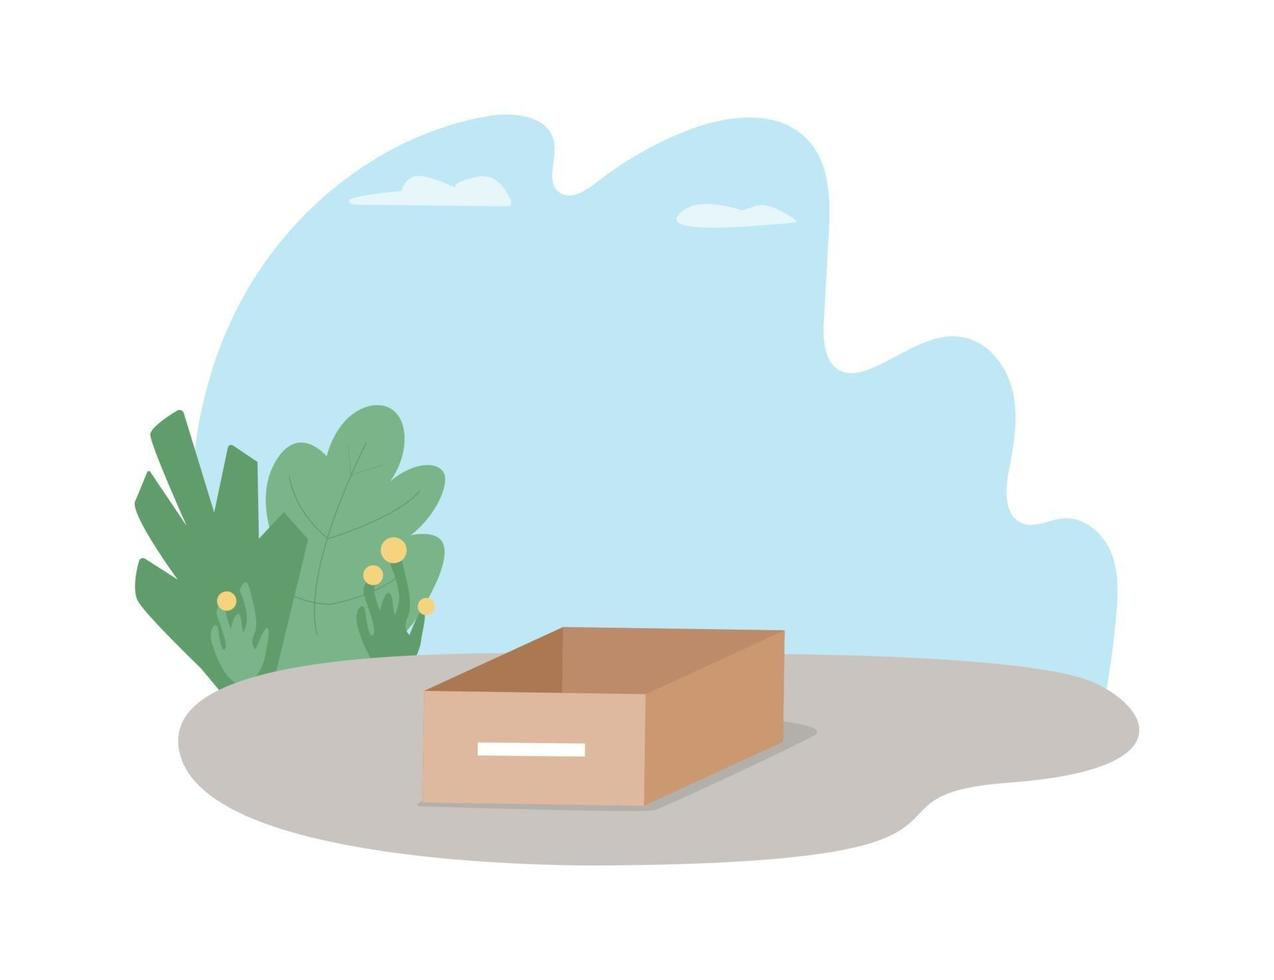 caja de cartón en la calle banner web de vector 2d, cartel